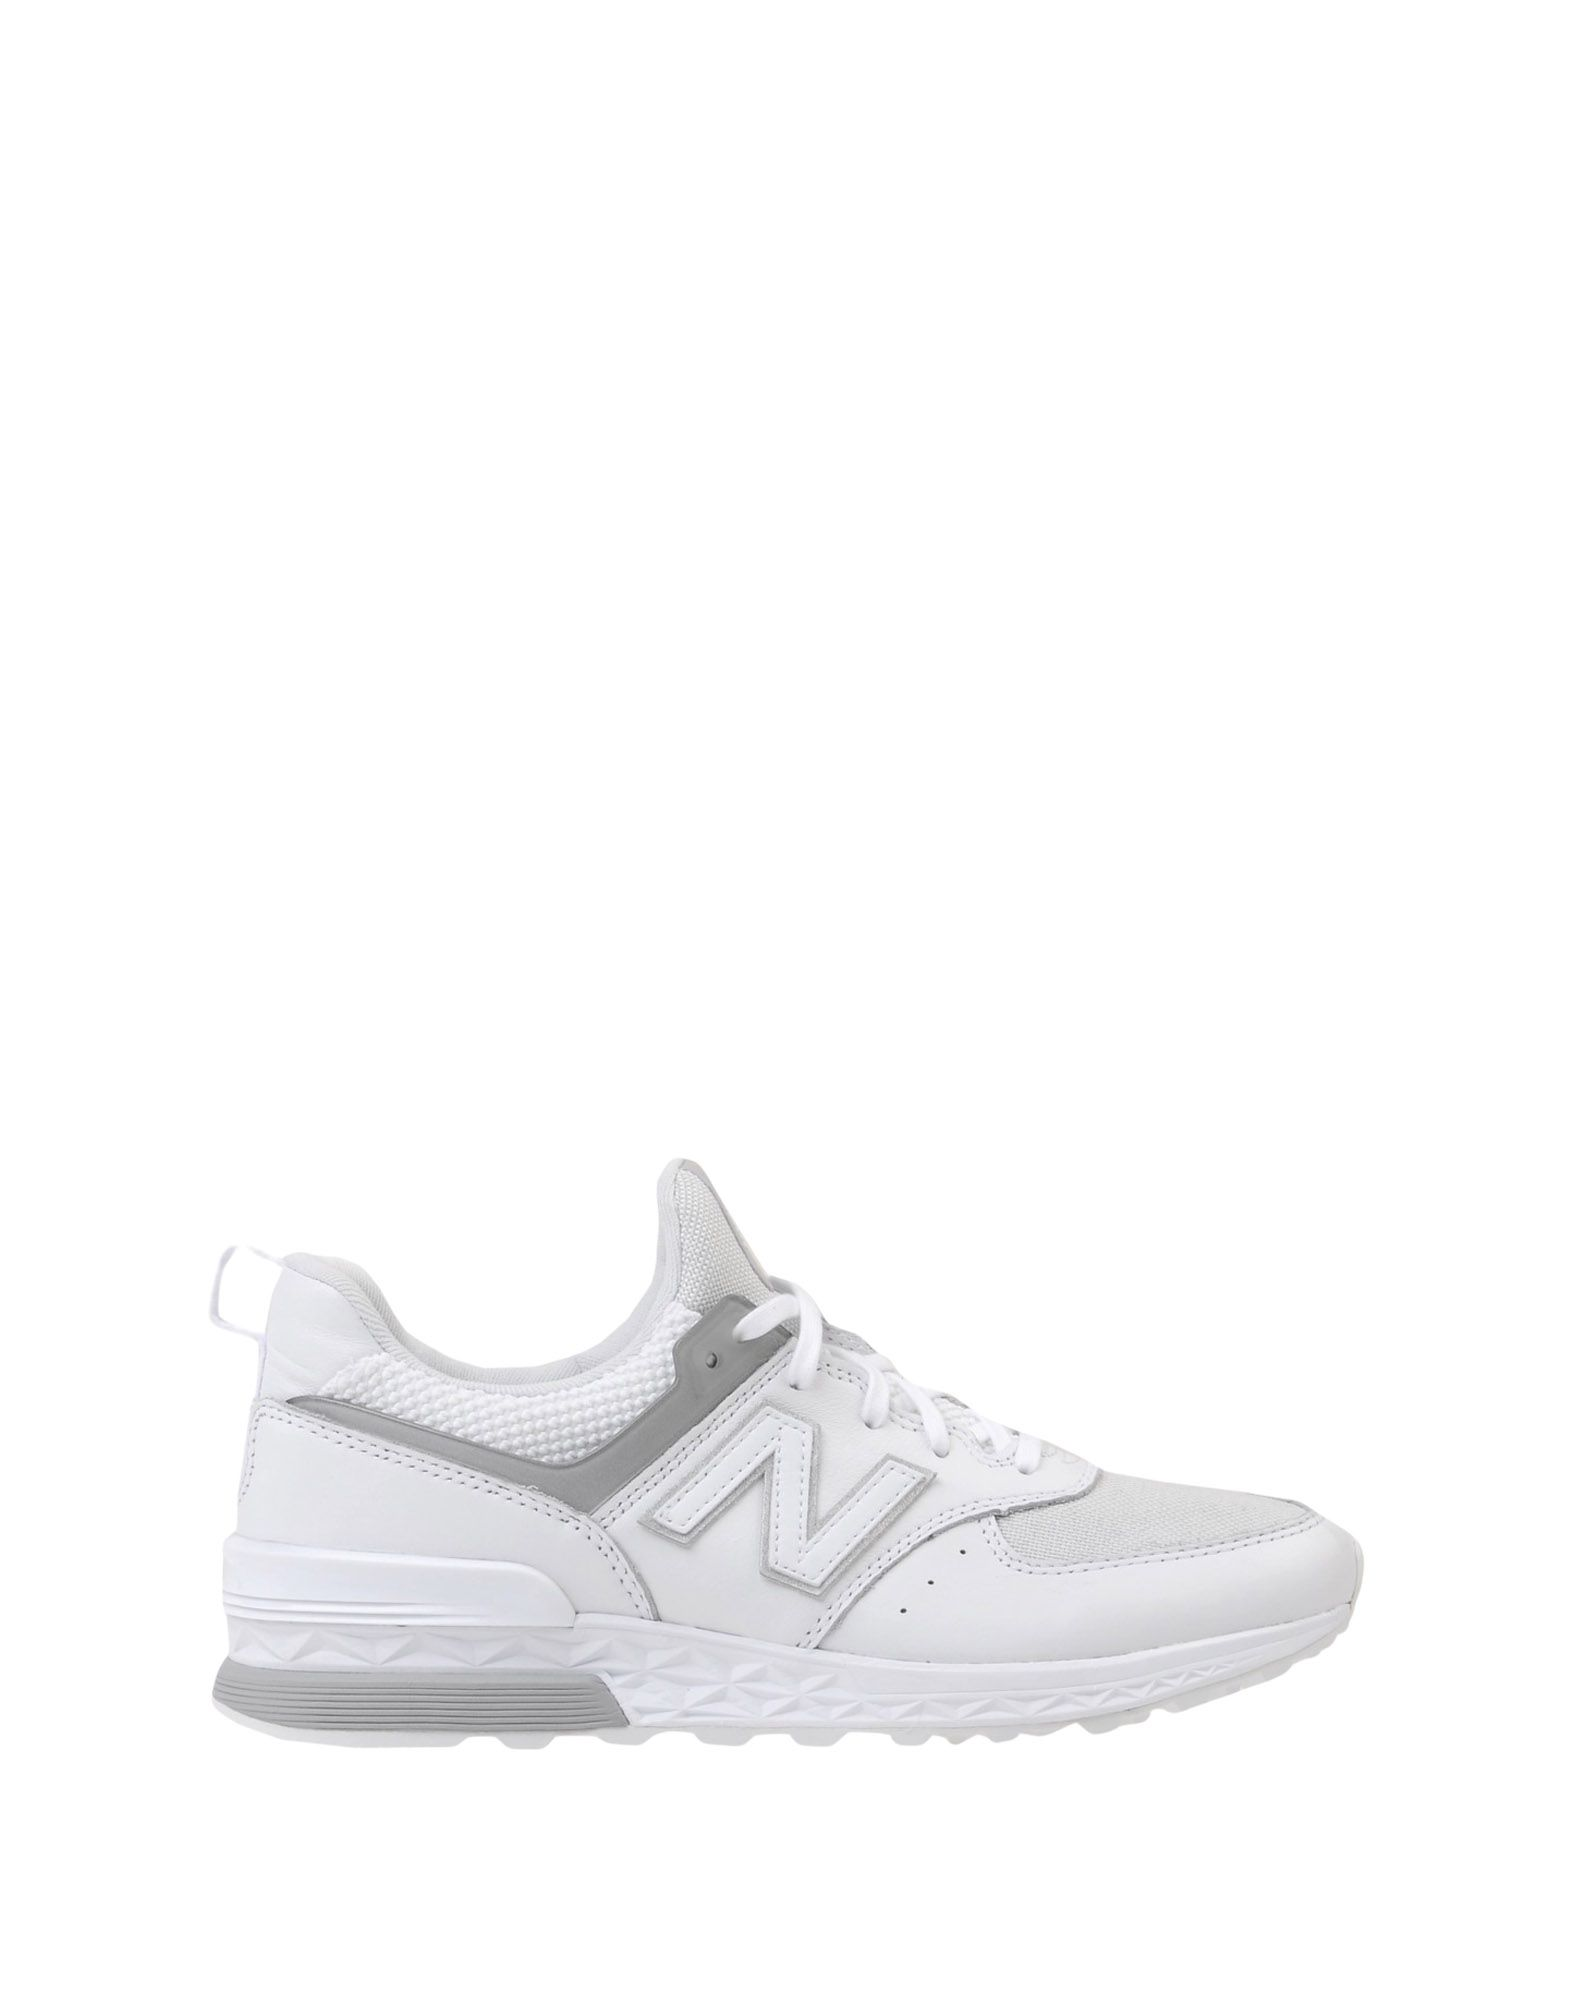 New Balance 574S Leather  beliebte 11466889RX Gute Qualität beliebte  Schuhe ee8626